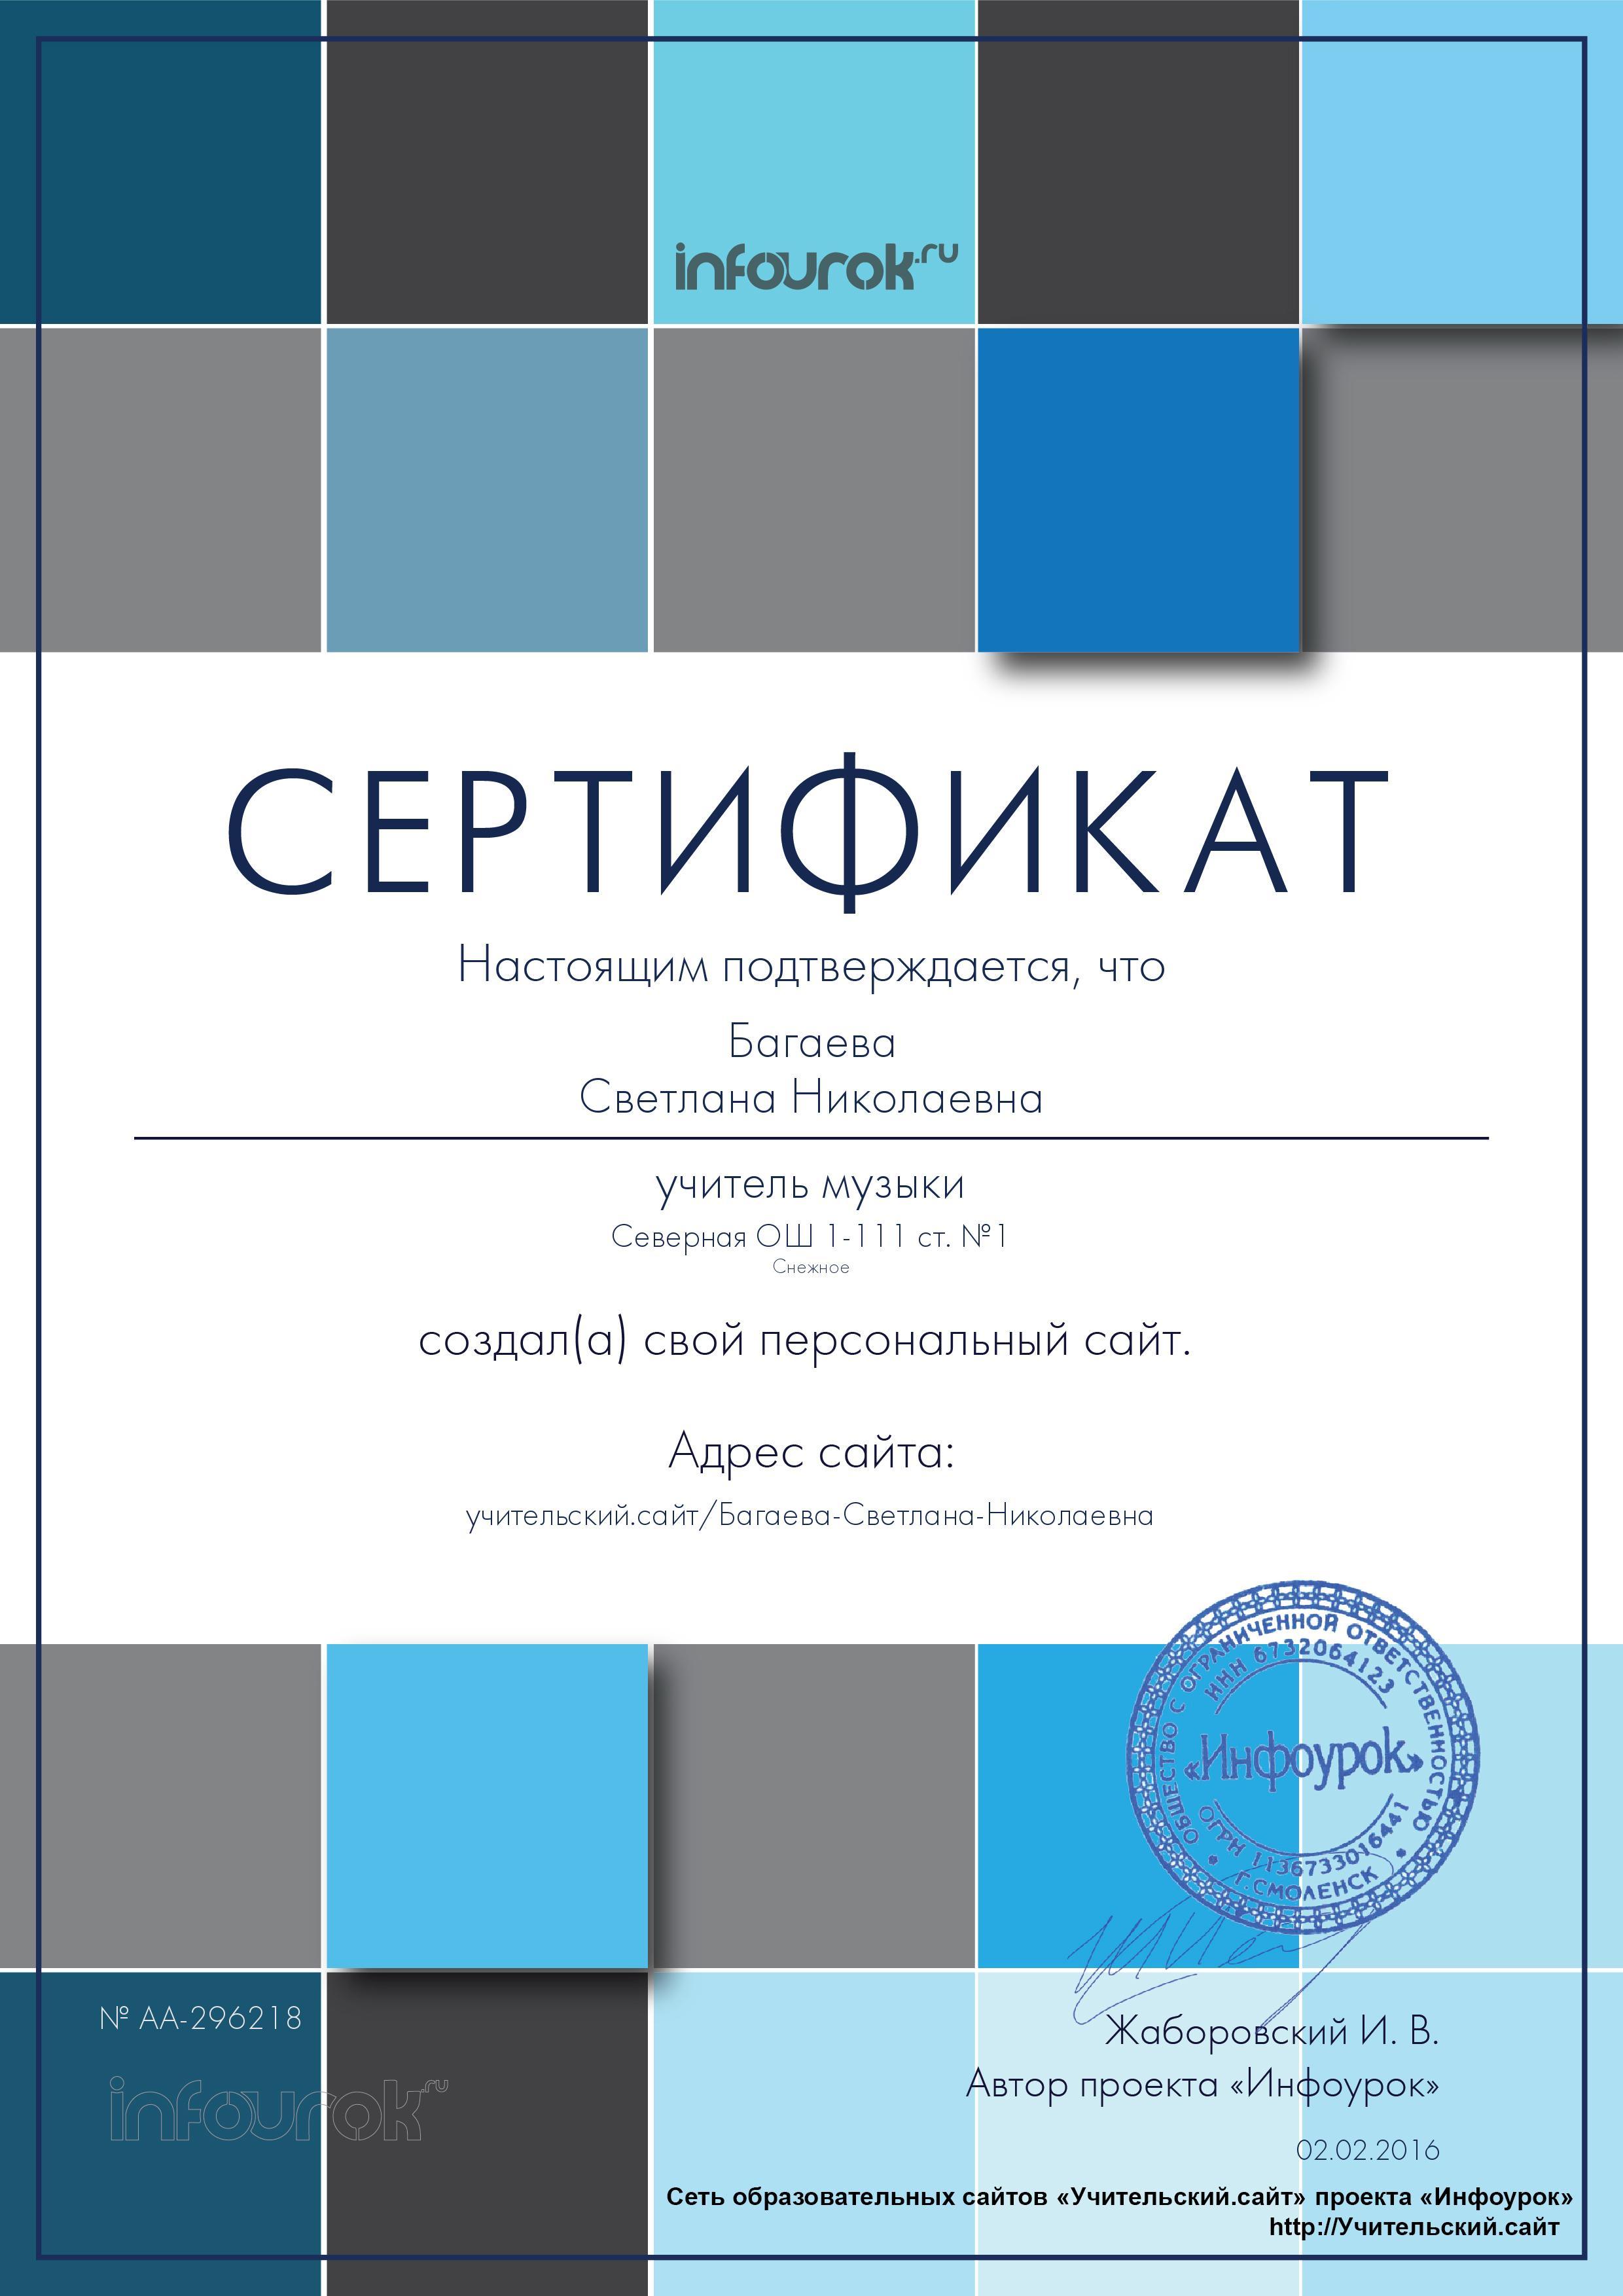 Сертификат проекта infourok.ru № АA-296218.jpg